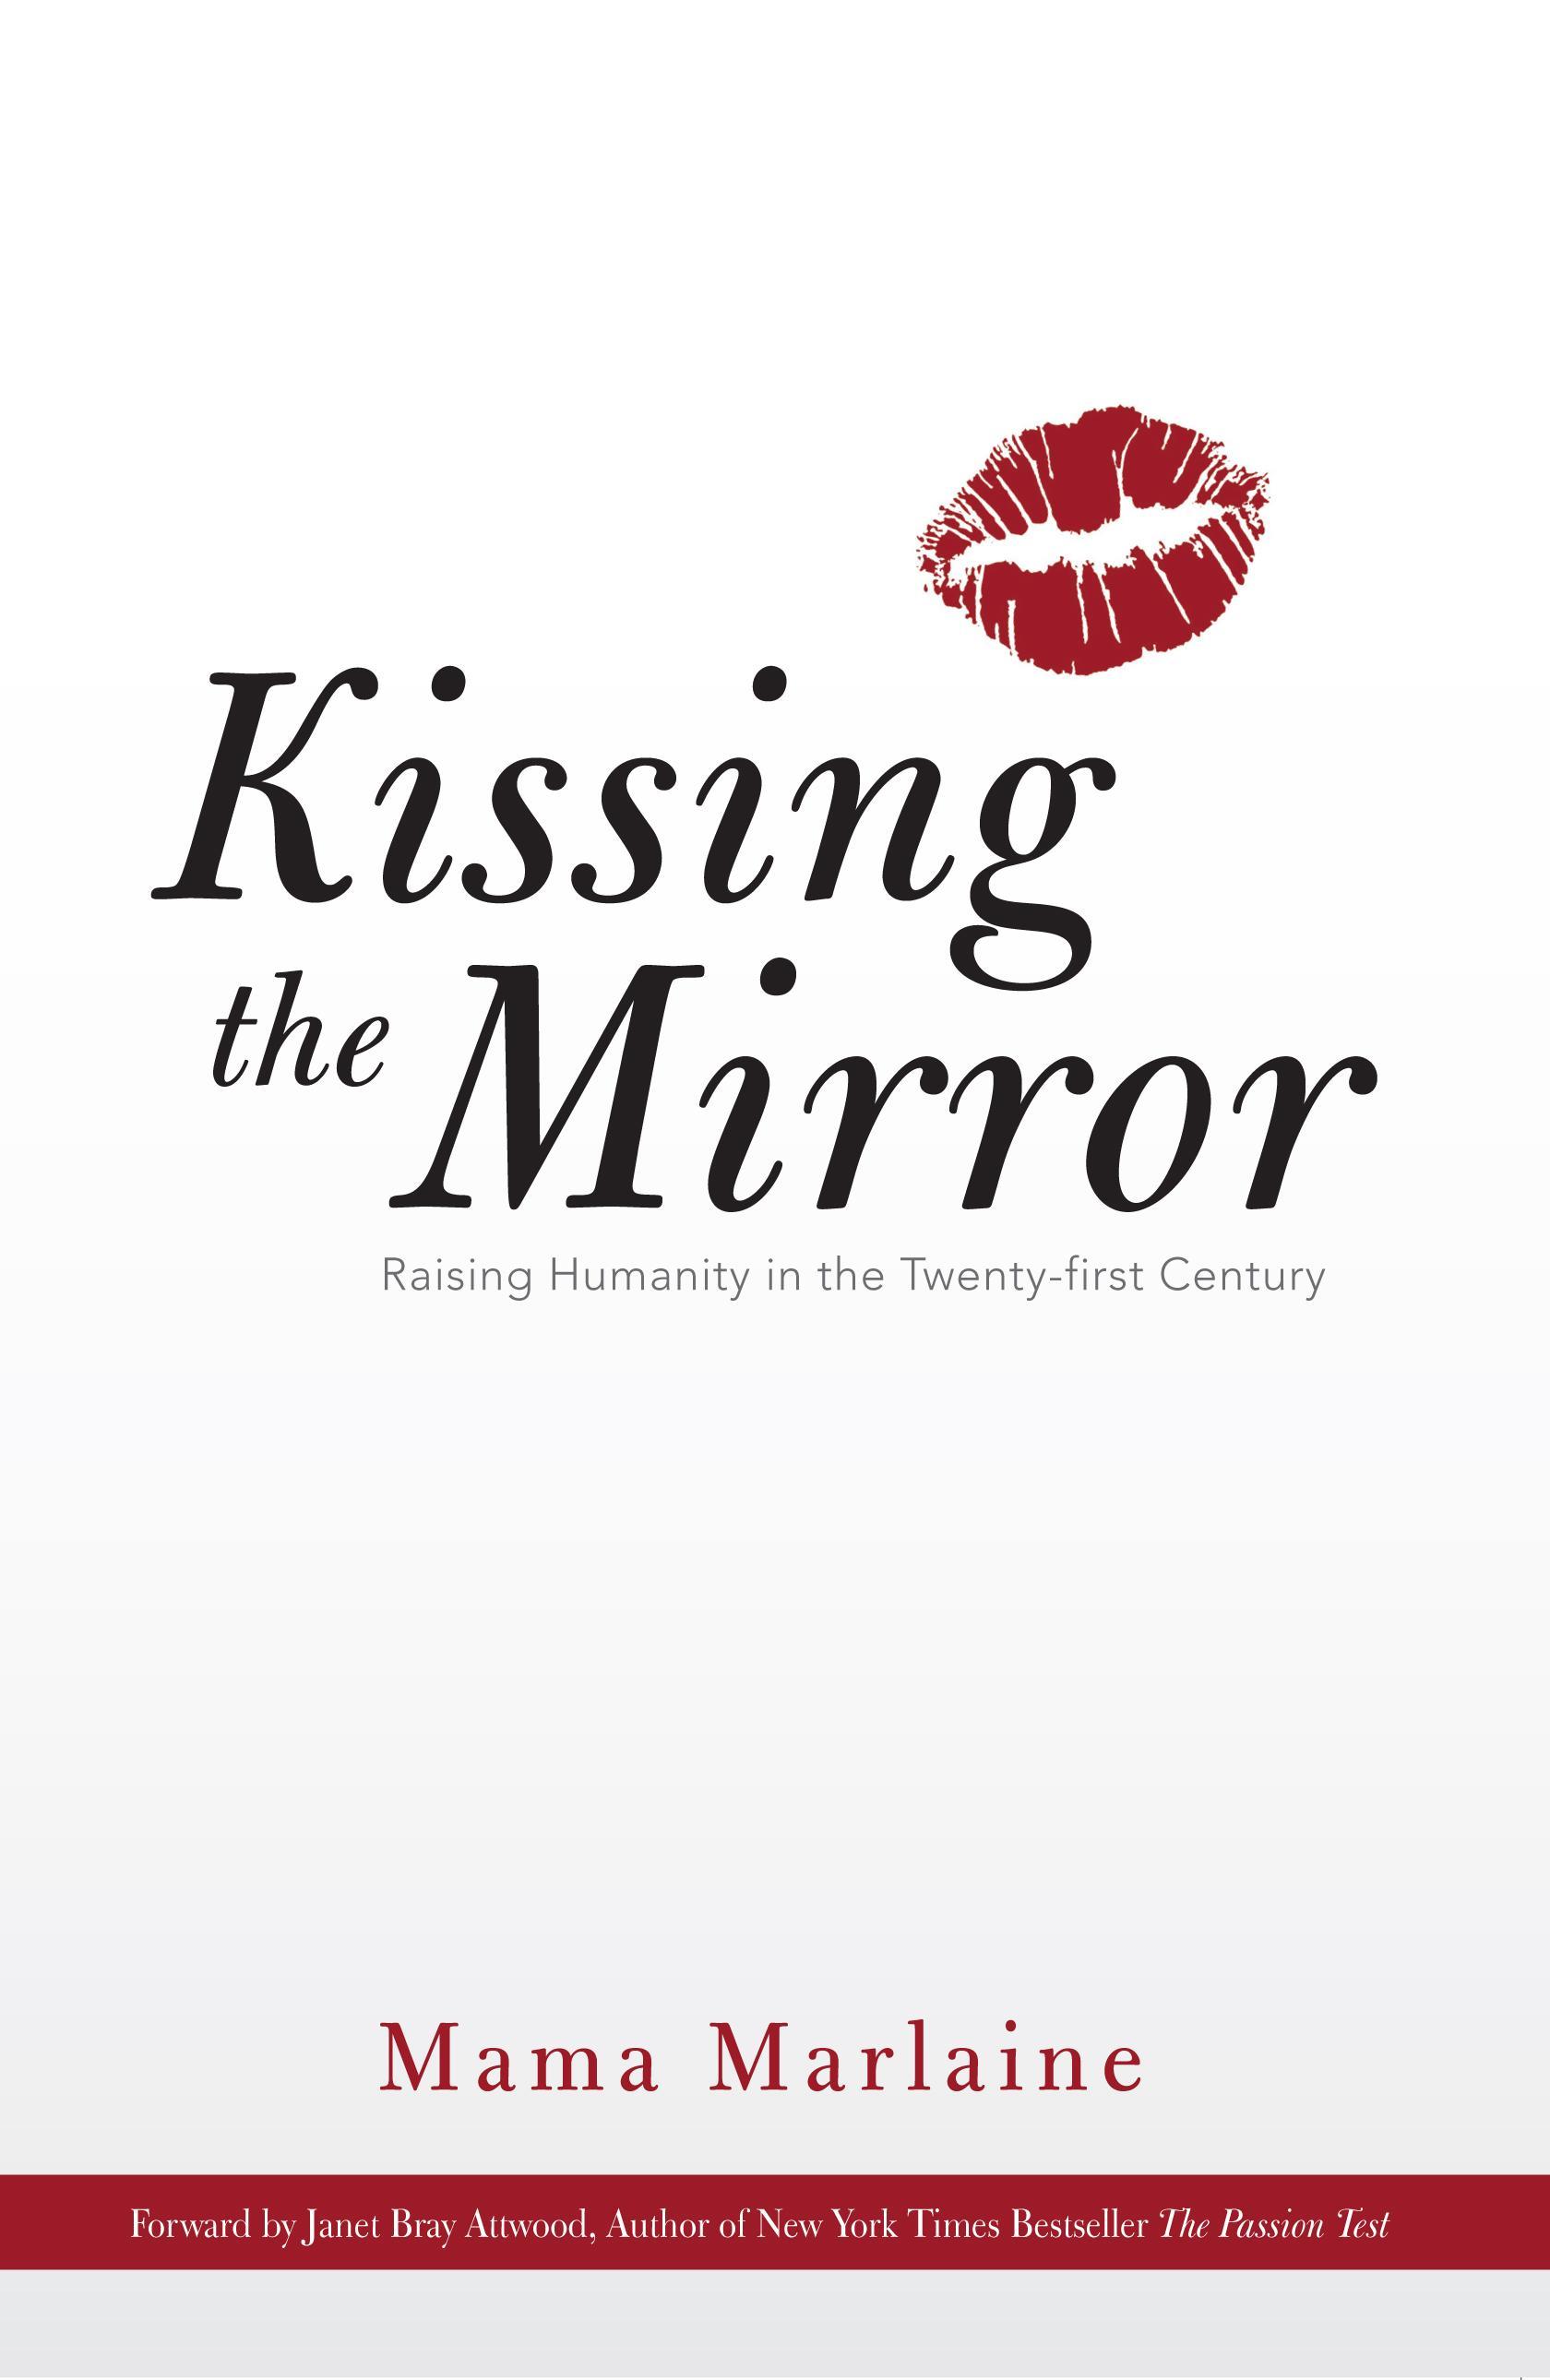 Kissing The Mirror: Raising Humanity in the Twenty-first Century. EB9781452551067